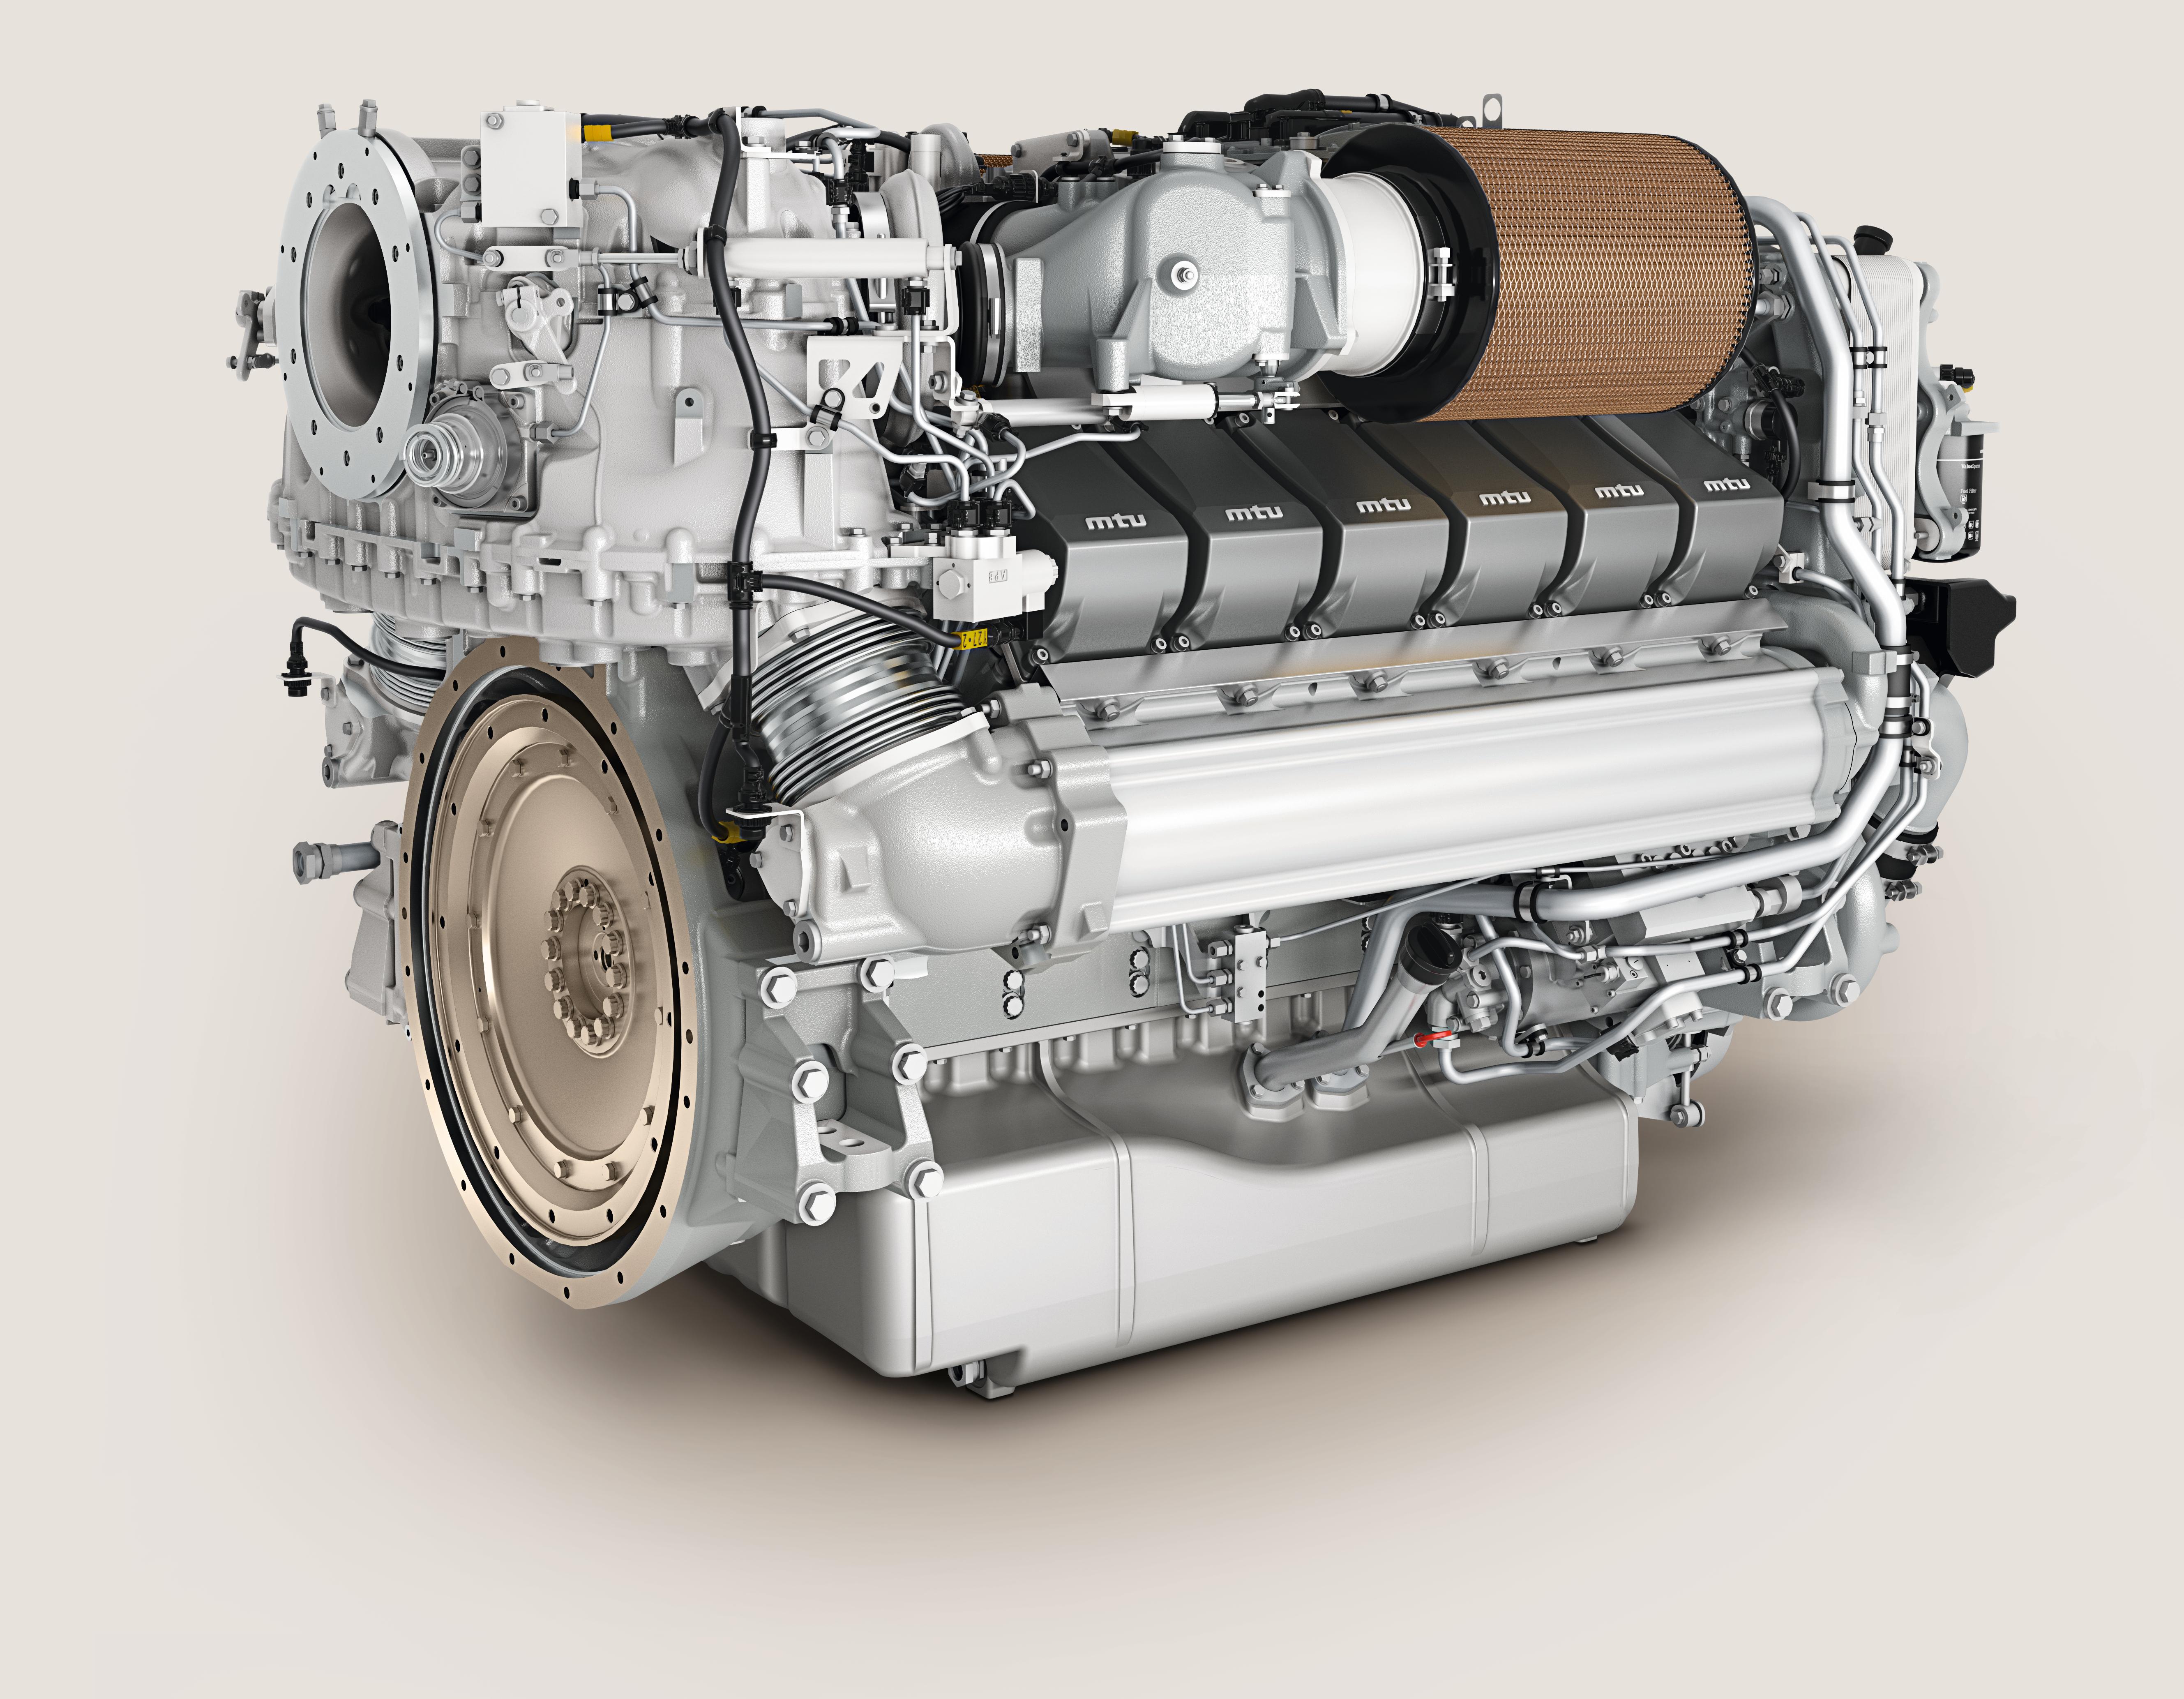 Rolls Royce to Present New Configuration of MTU Series 2000 Yacht